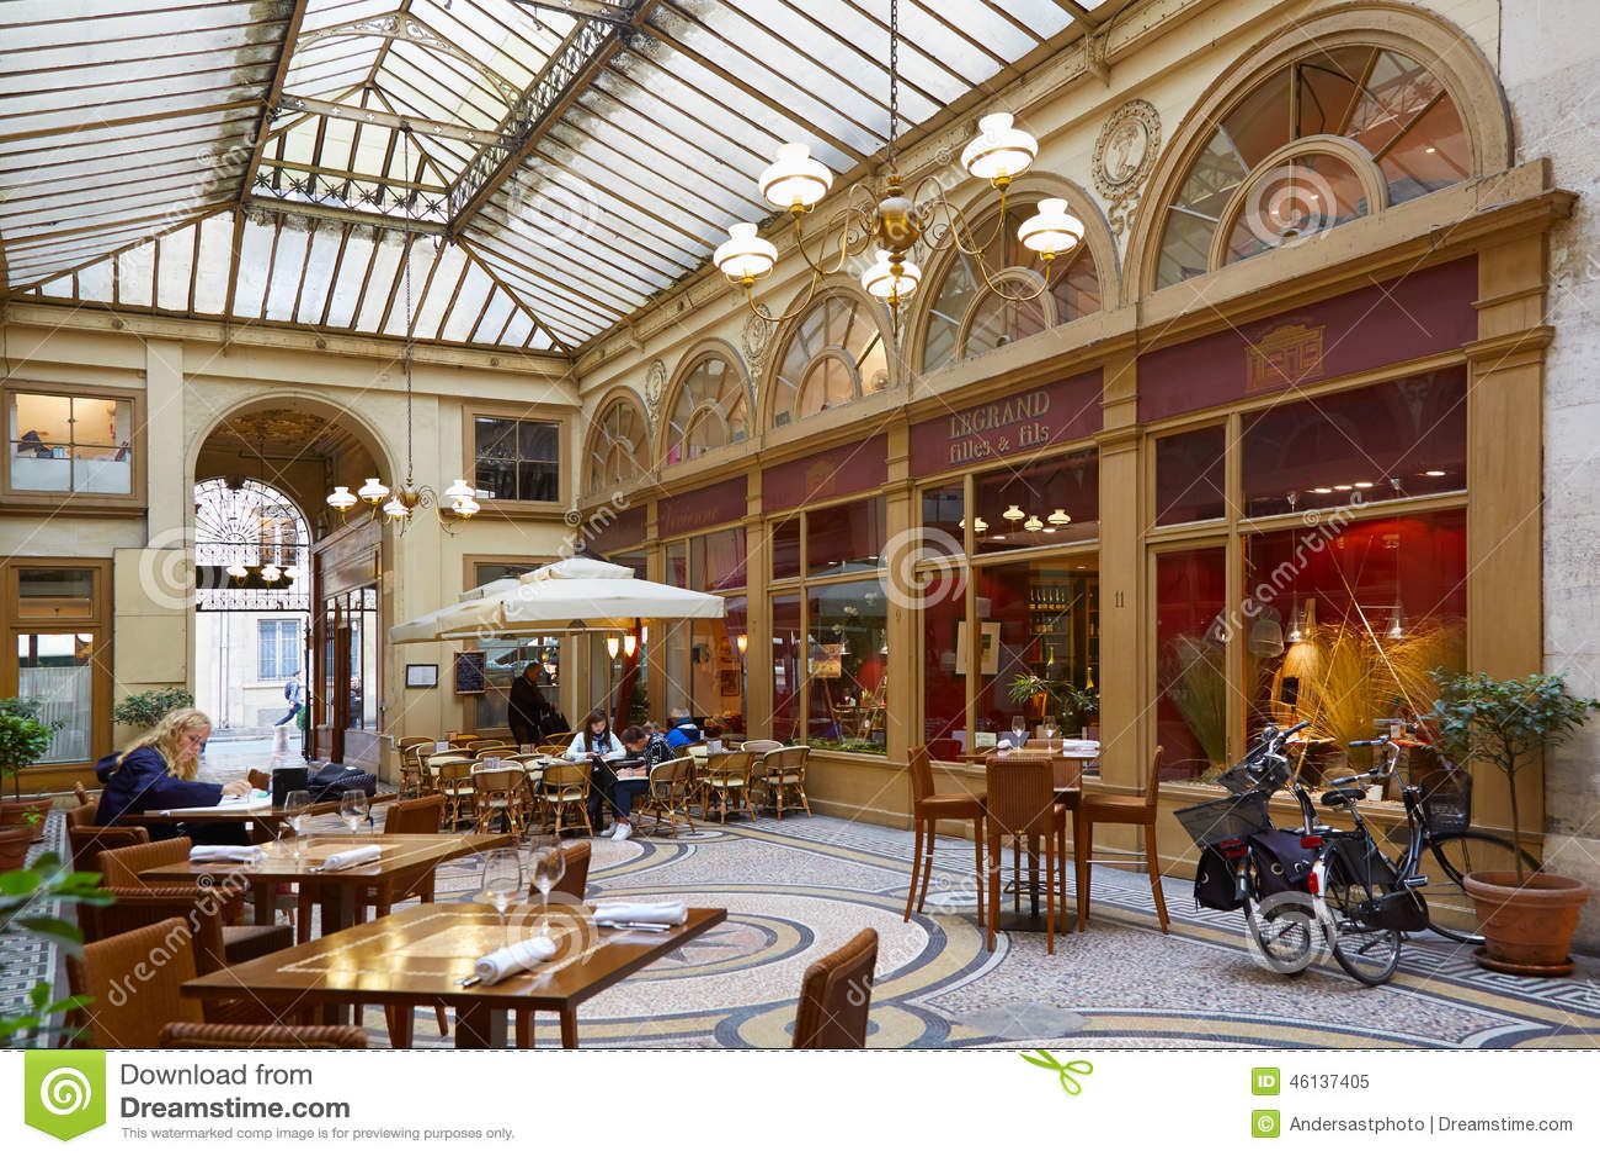 Paris Galerie Vivienne Passage With Restaurant Editorial